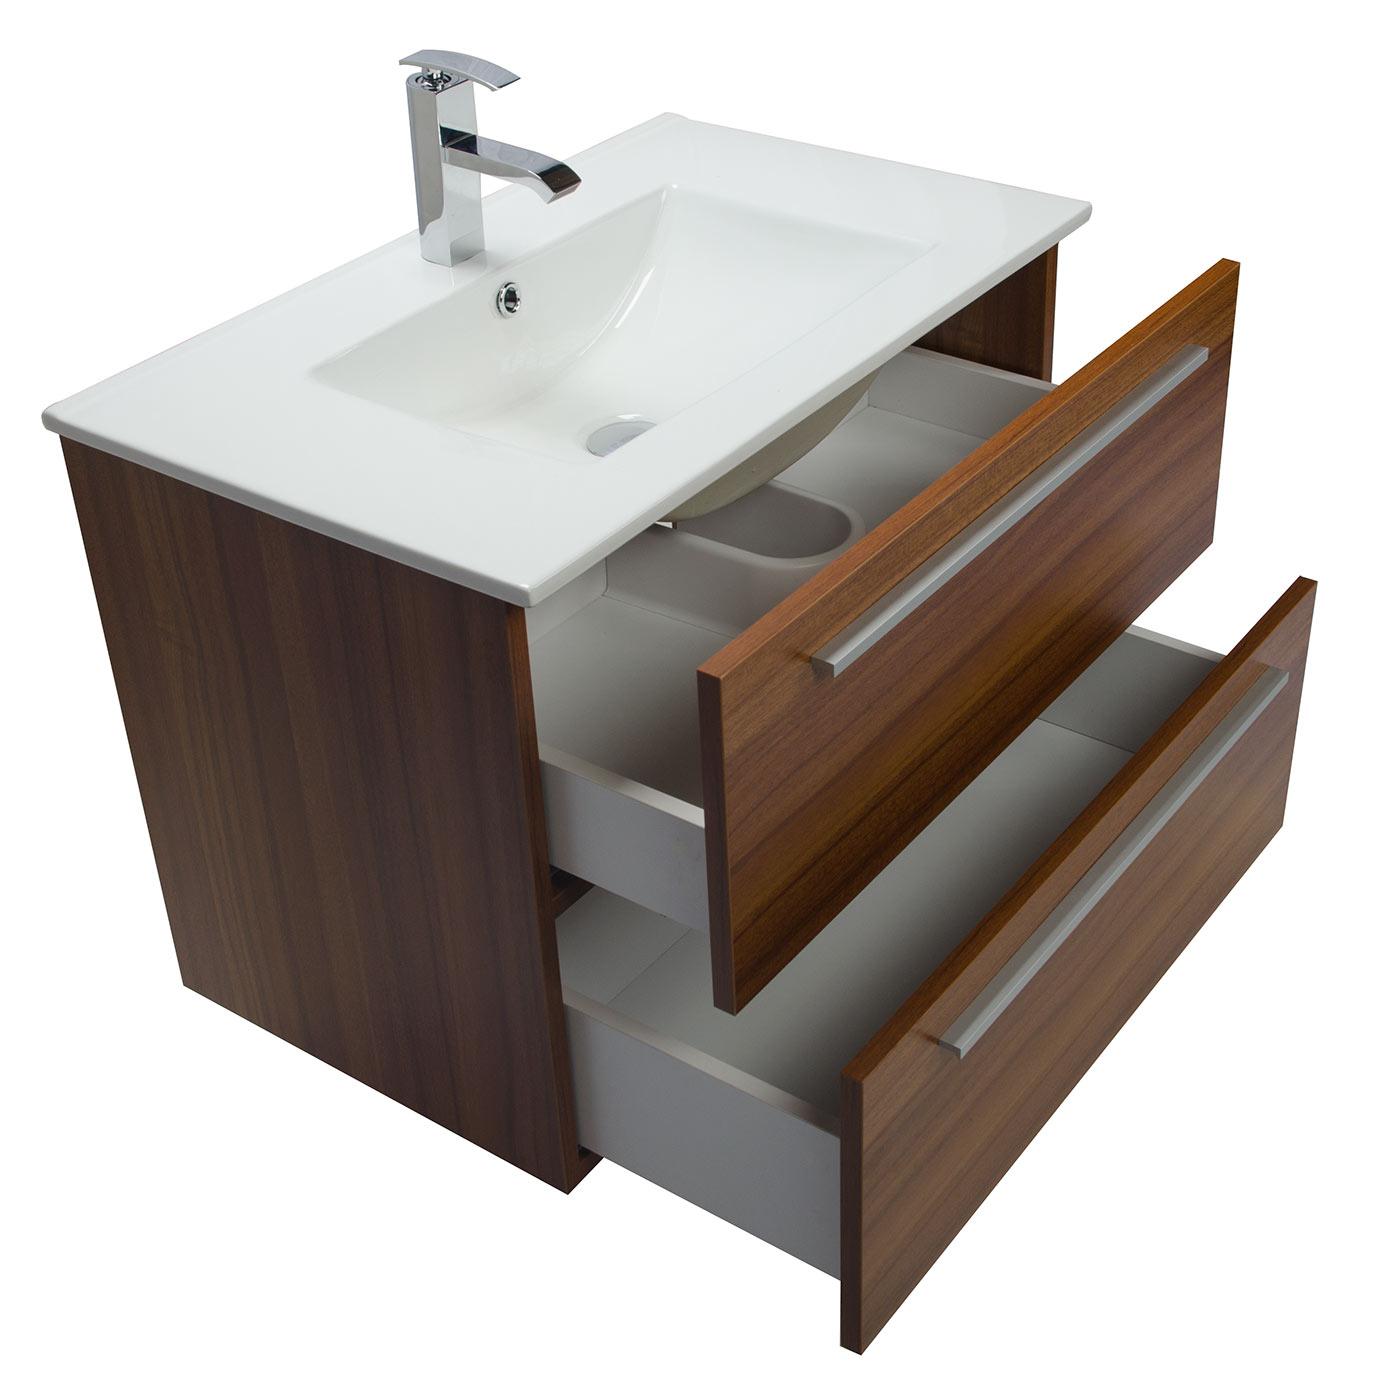 Buy Nola 29 5 Inch Wall Mount Modern Bathroom Vanity Teak TN T750C TK on Conc